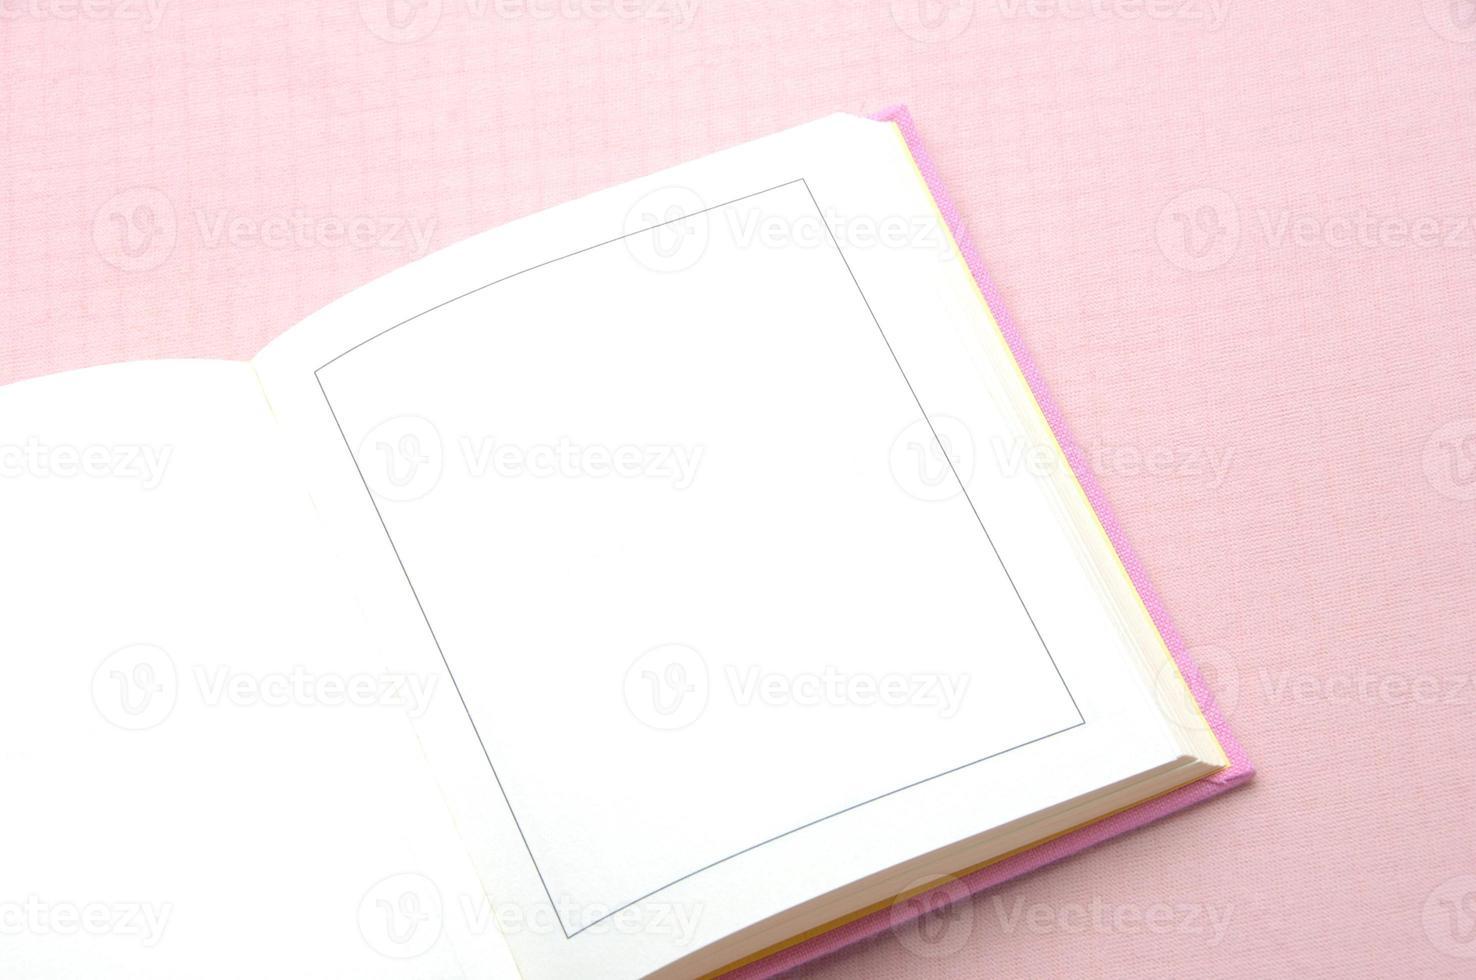 geopend boek op roze achtergrond foto